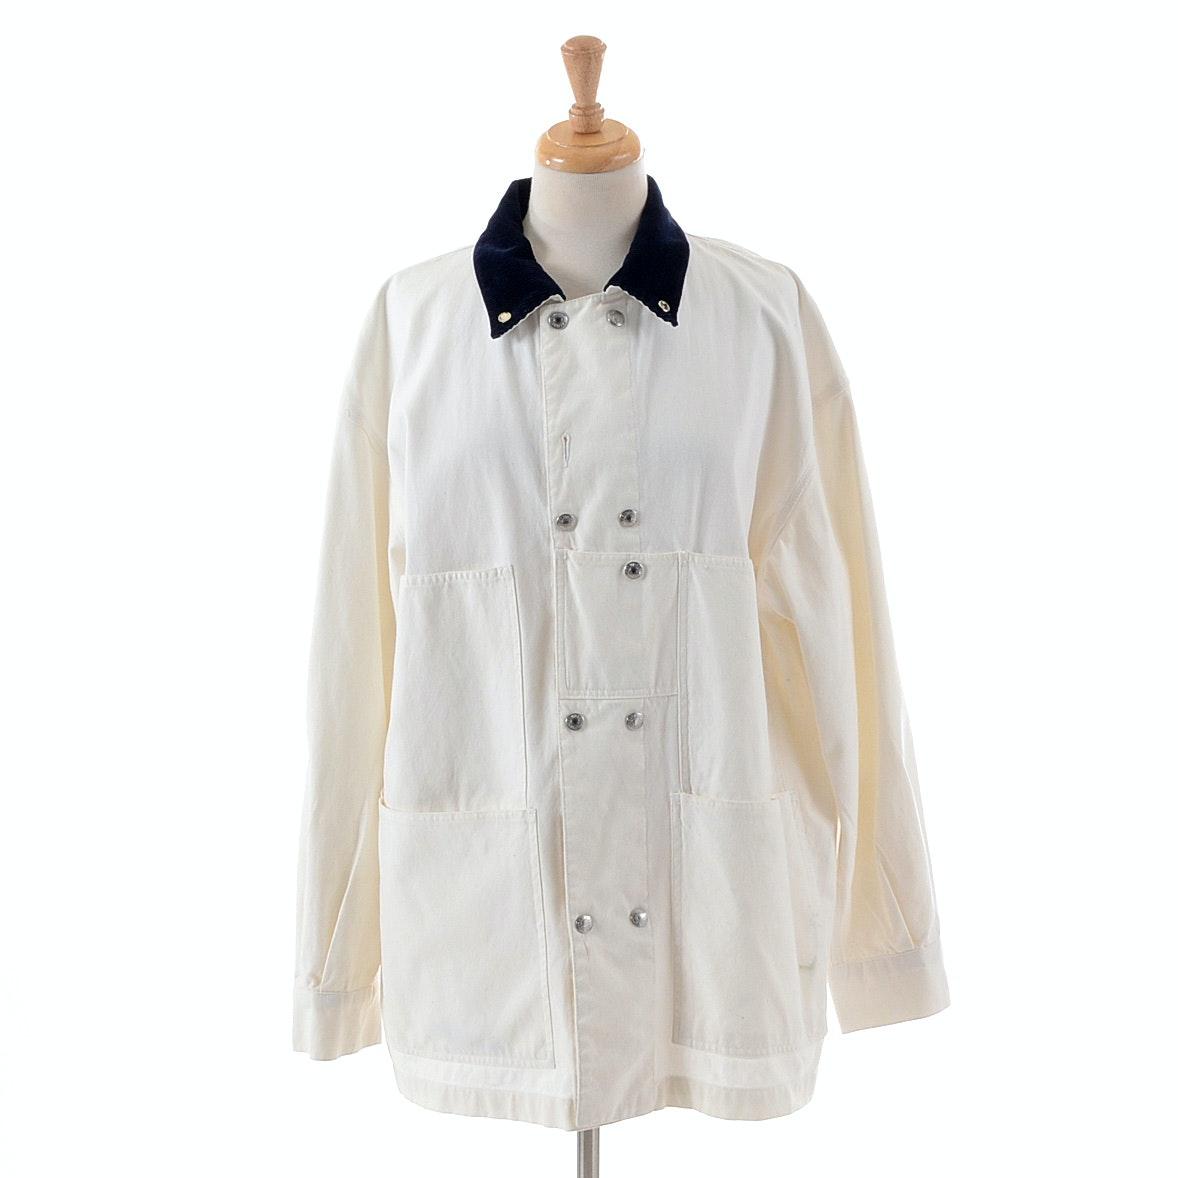 1990s Calvin Klein White Canvas Jacket